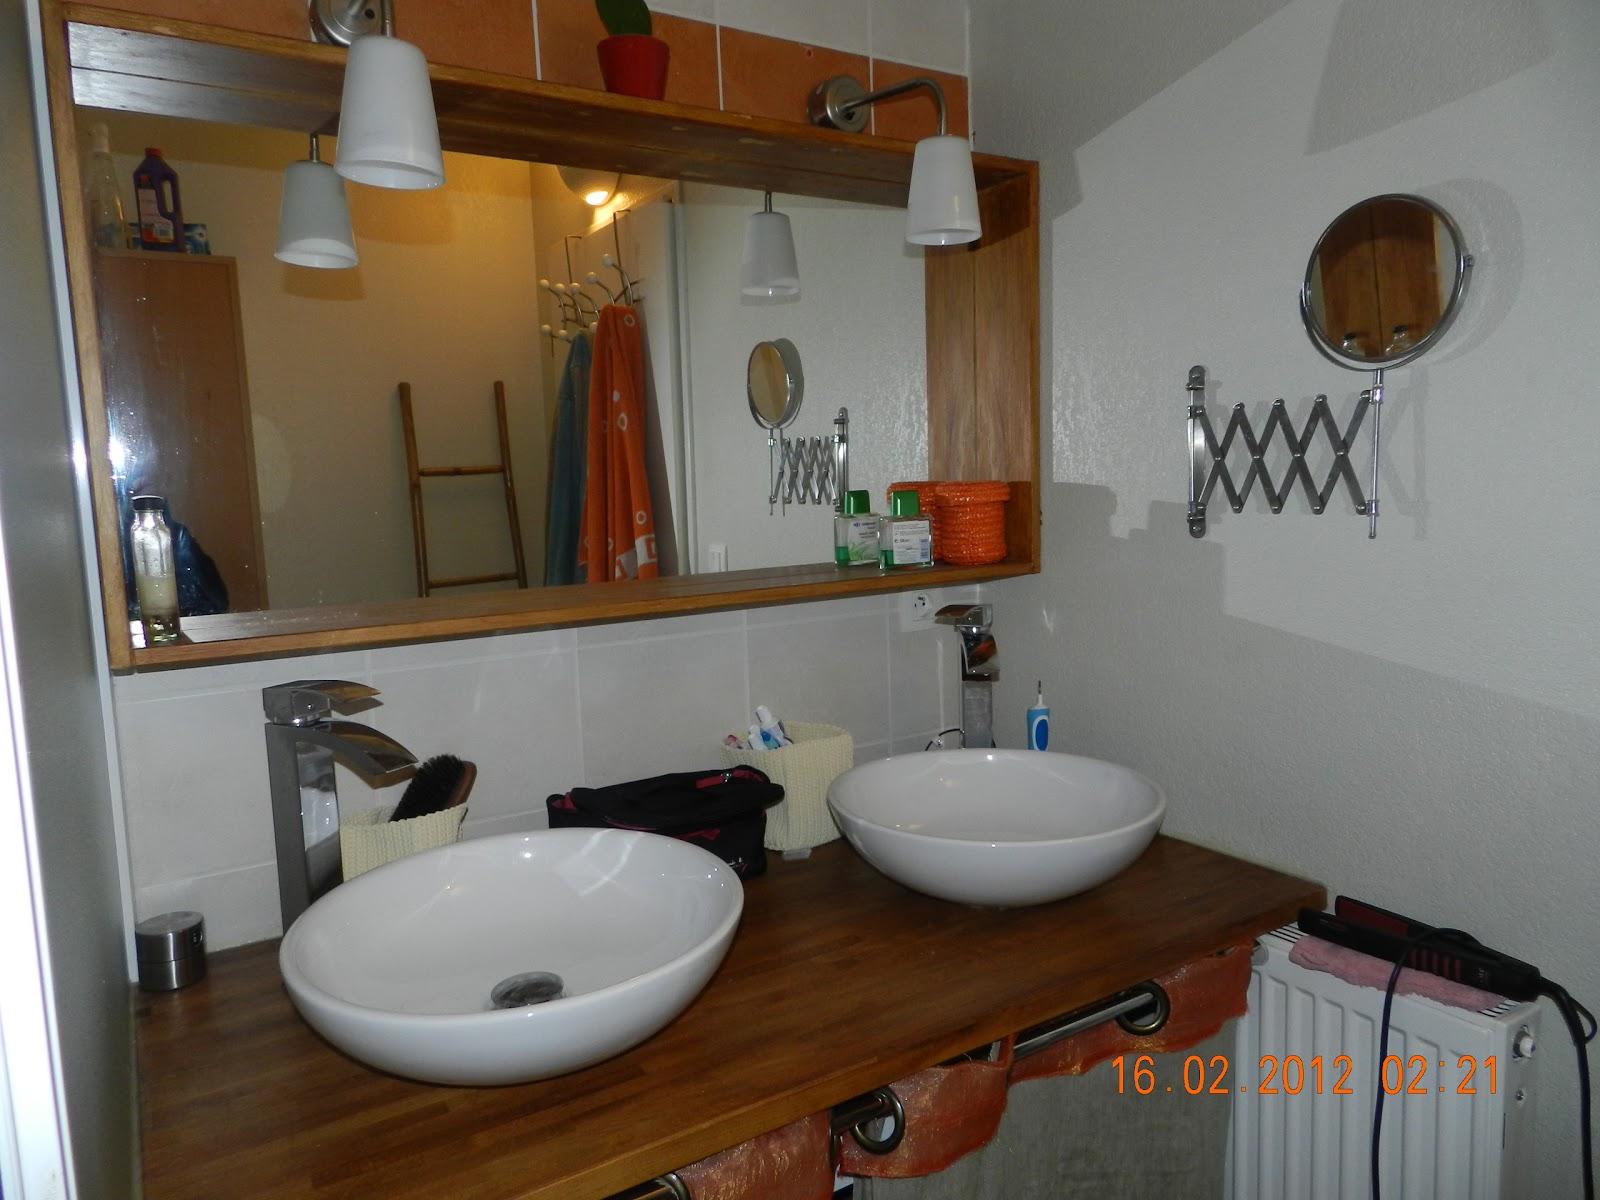 Parquet teck salle de bain leroy merlin parquet massif - Parquet teck salle de bain leroy merlin ...